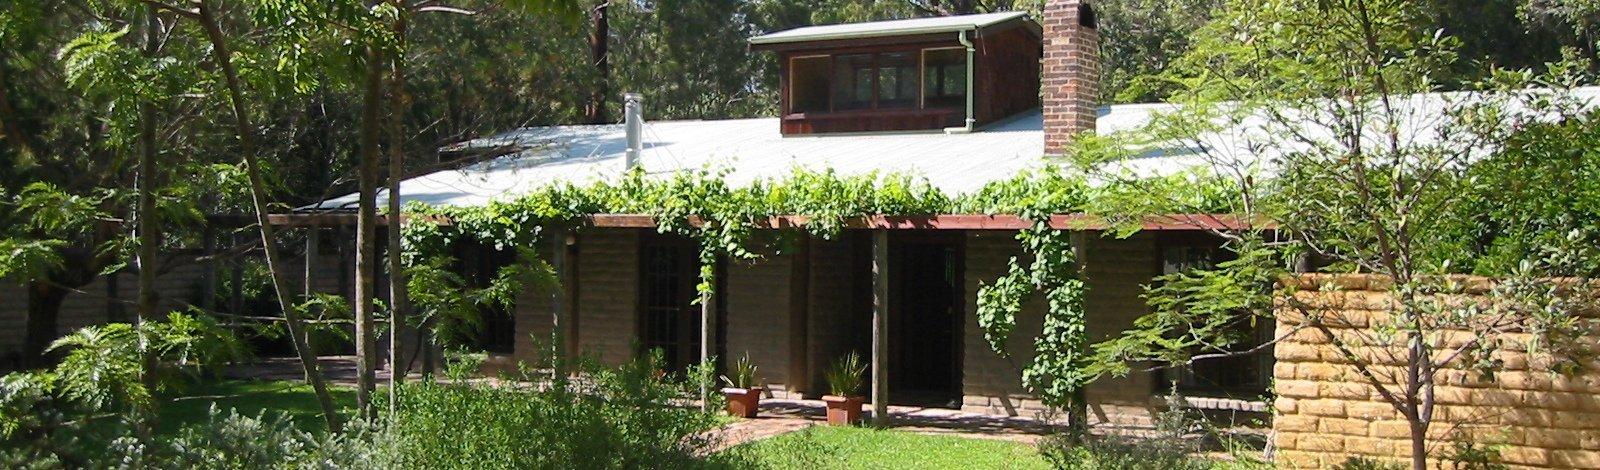 A Low Carbon Mud Brick Home Etool